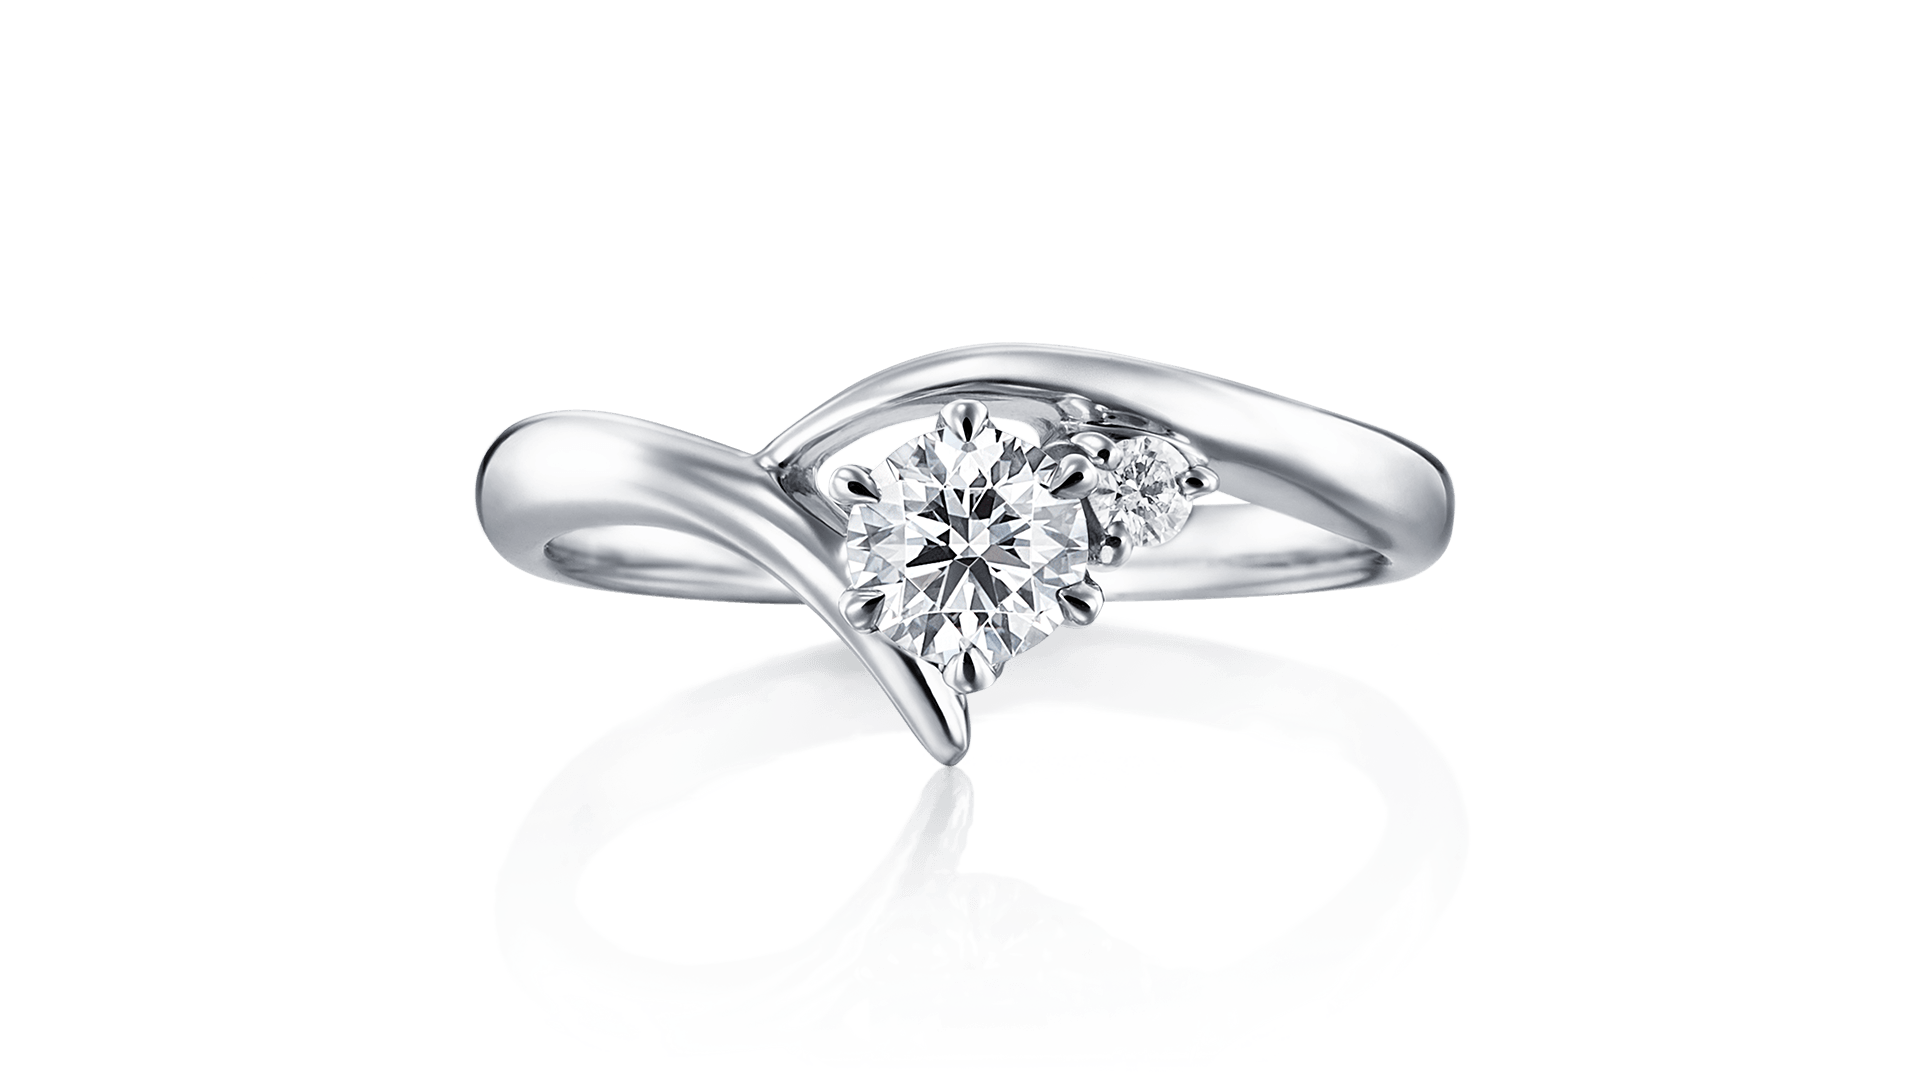 lesart レサート | 婚約指輪サムネイル 1